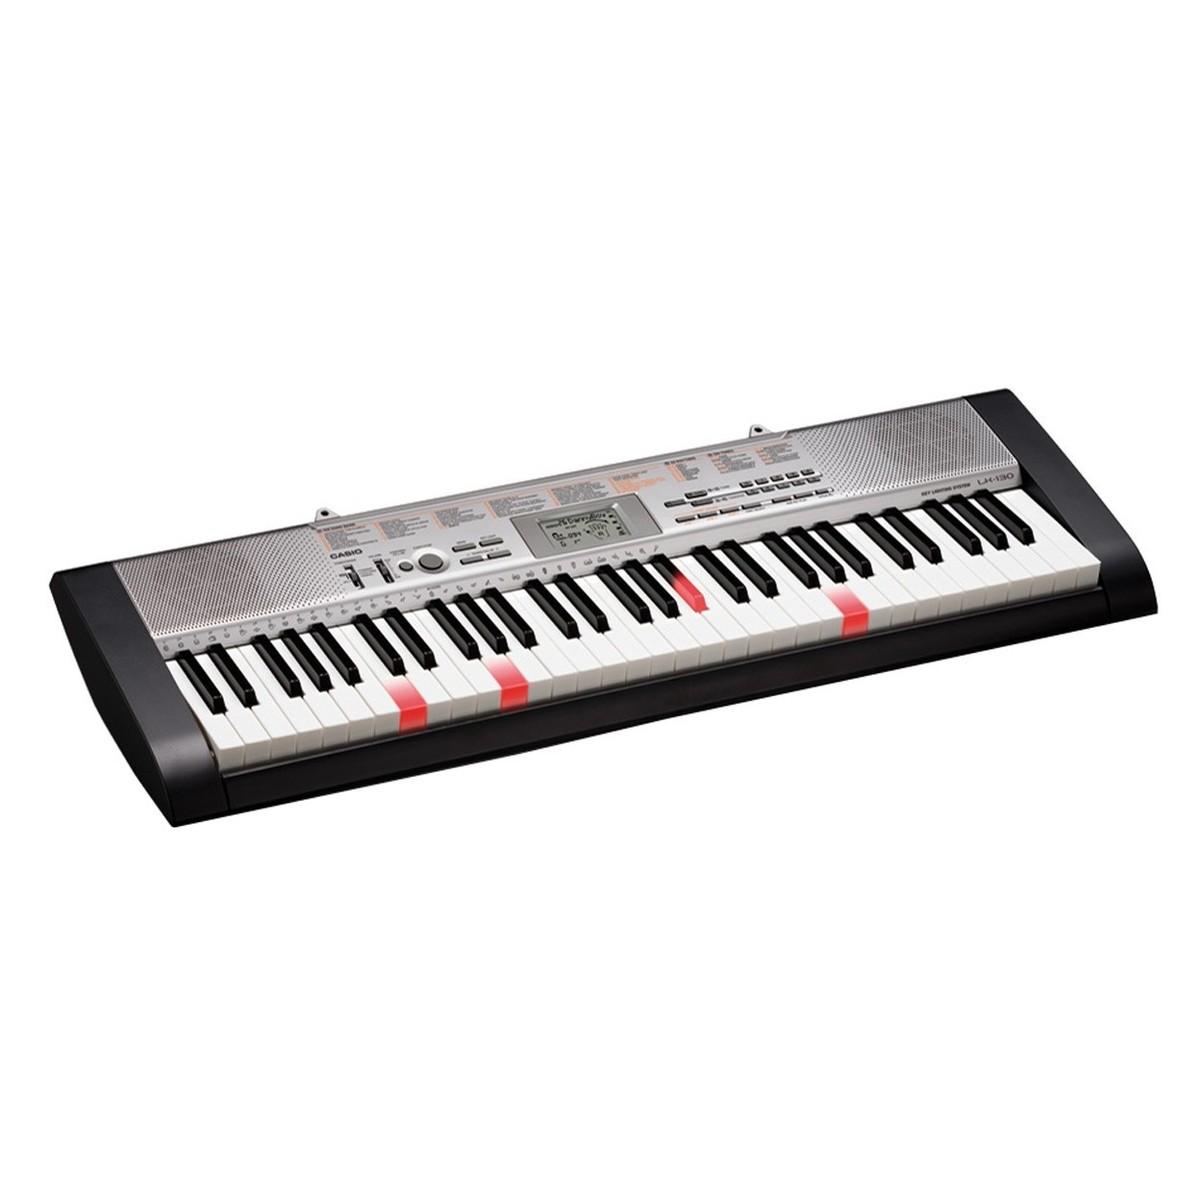 disc casio lk 130 keylighting clavier. Black Bedroom Furniture Sets. Home Design Ideas